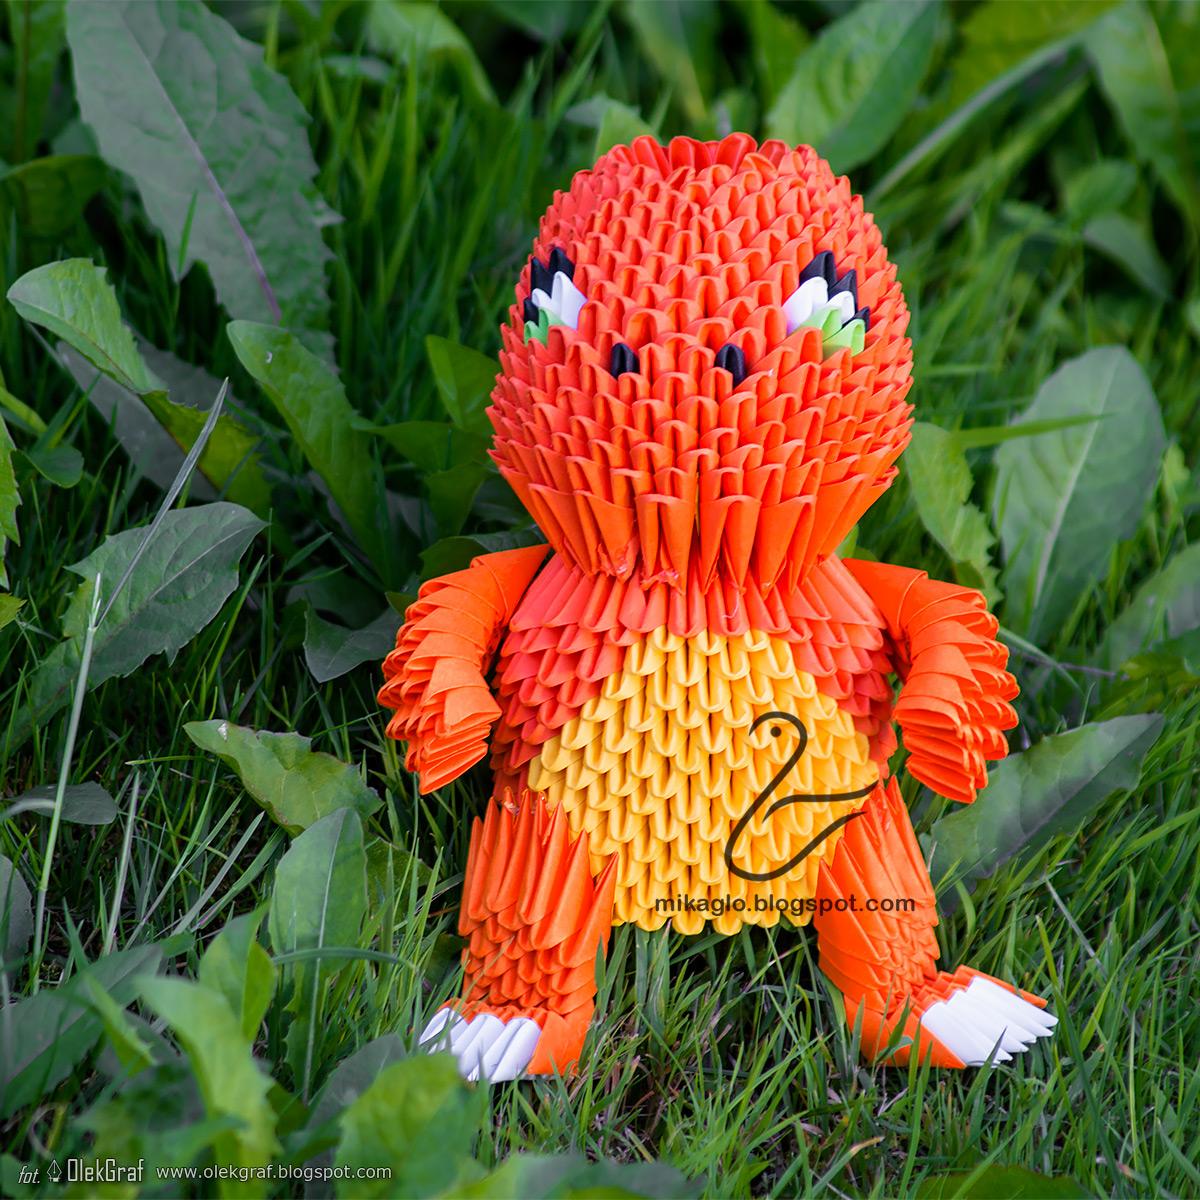 Origami 3d - mikaglo: 291. Pokemon Go - Charmander z ... - photo#25